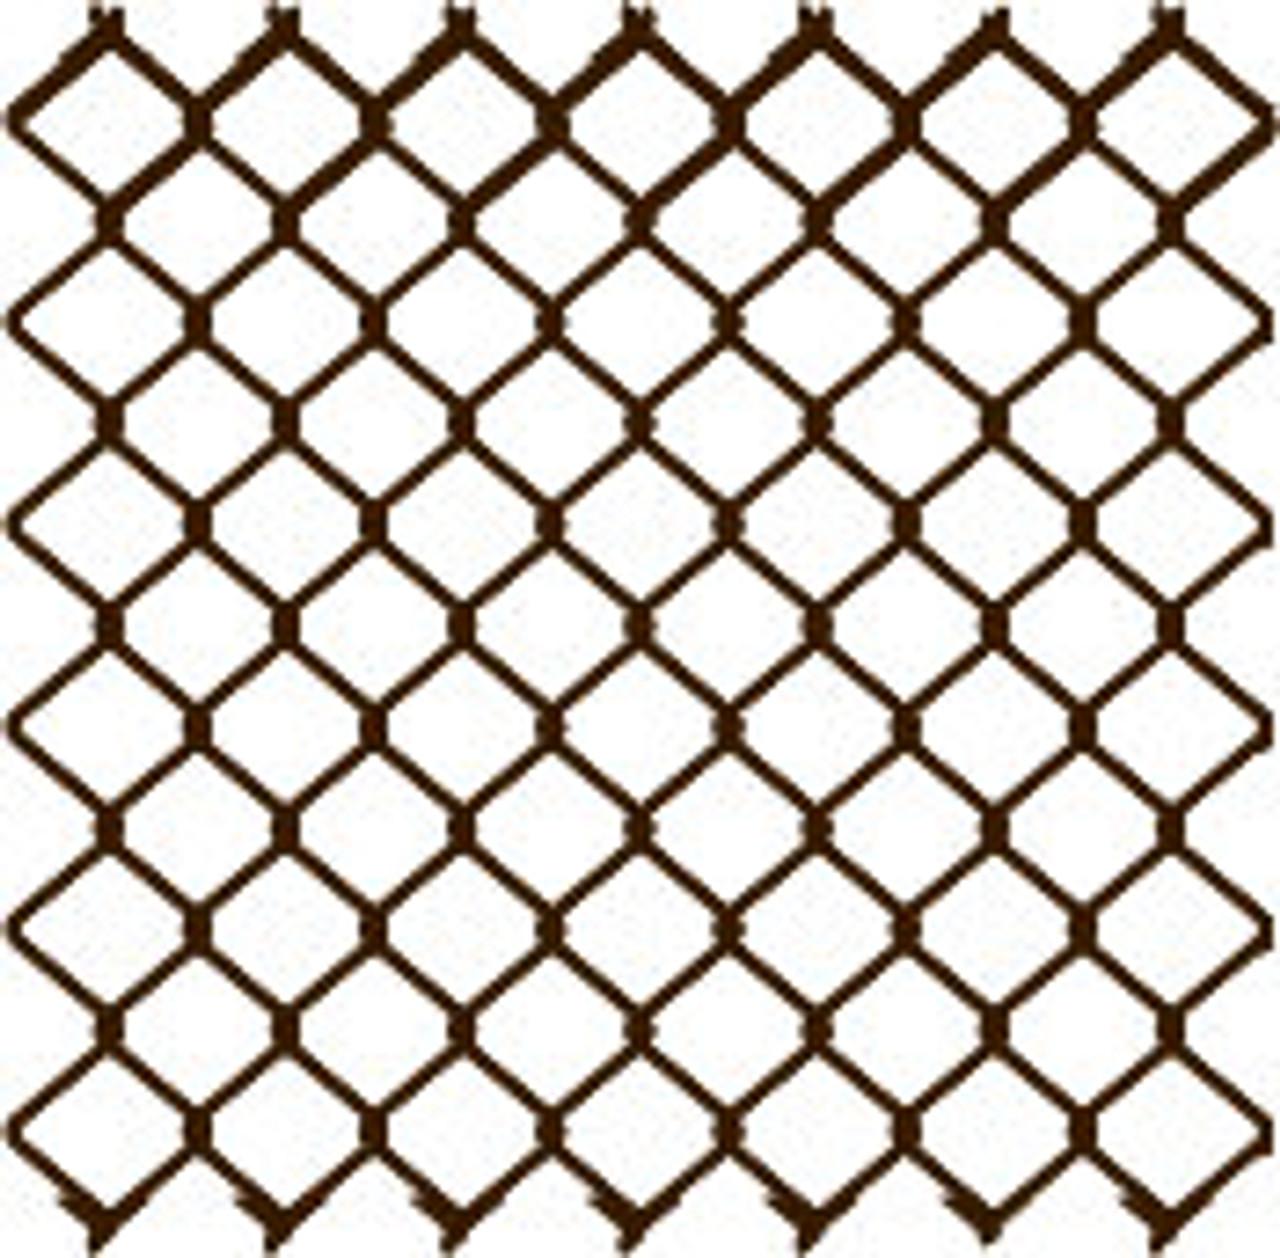 Brown Chain Link Illustration